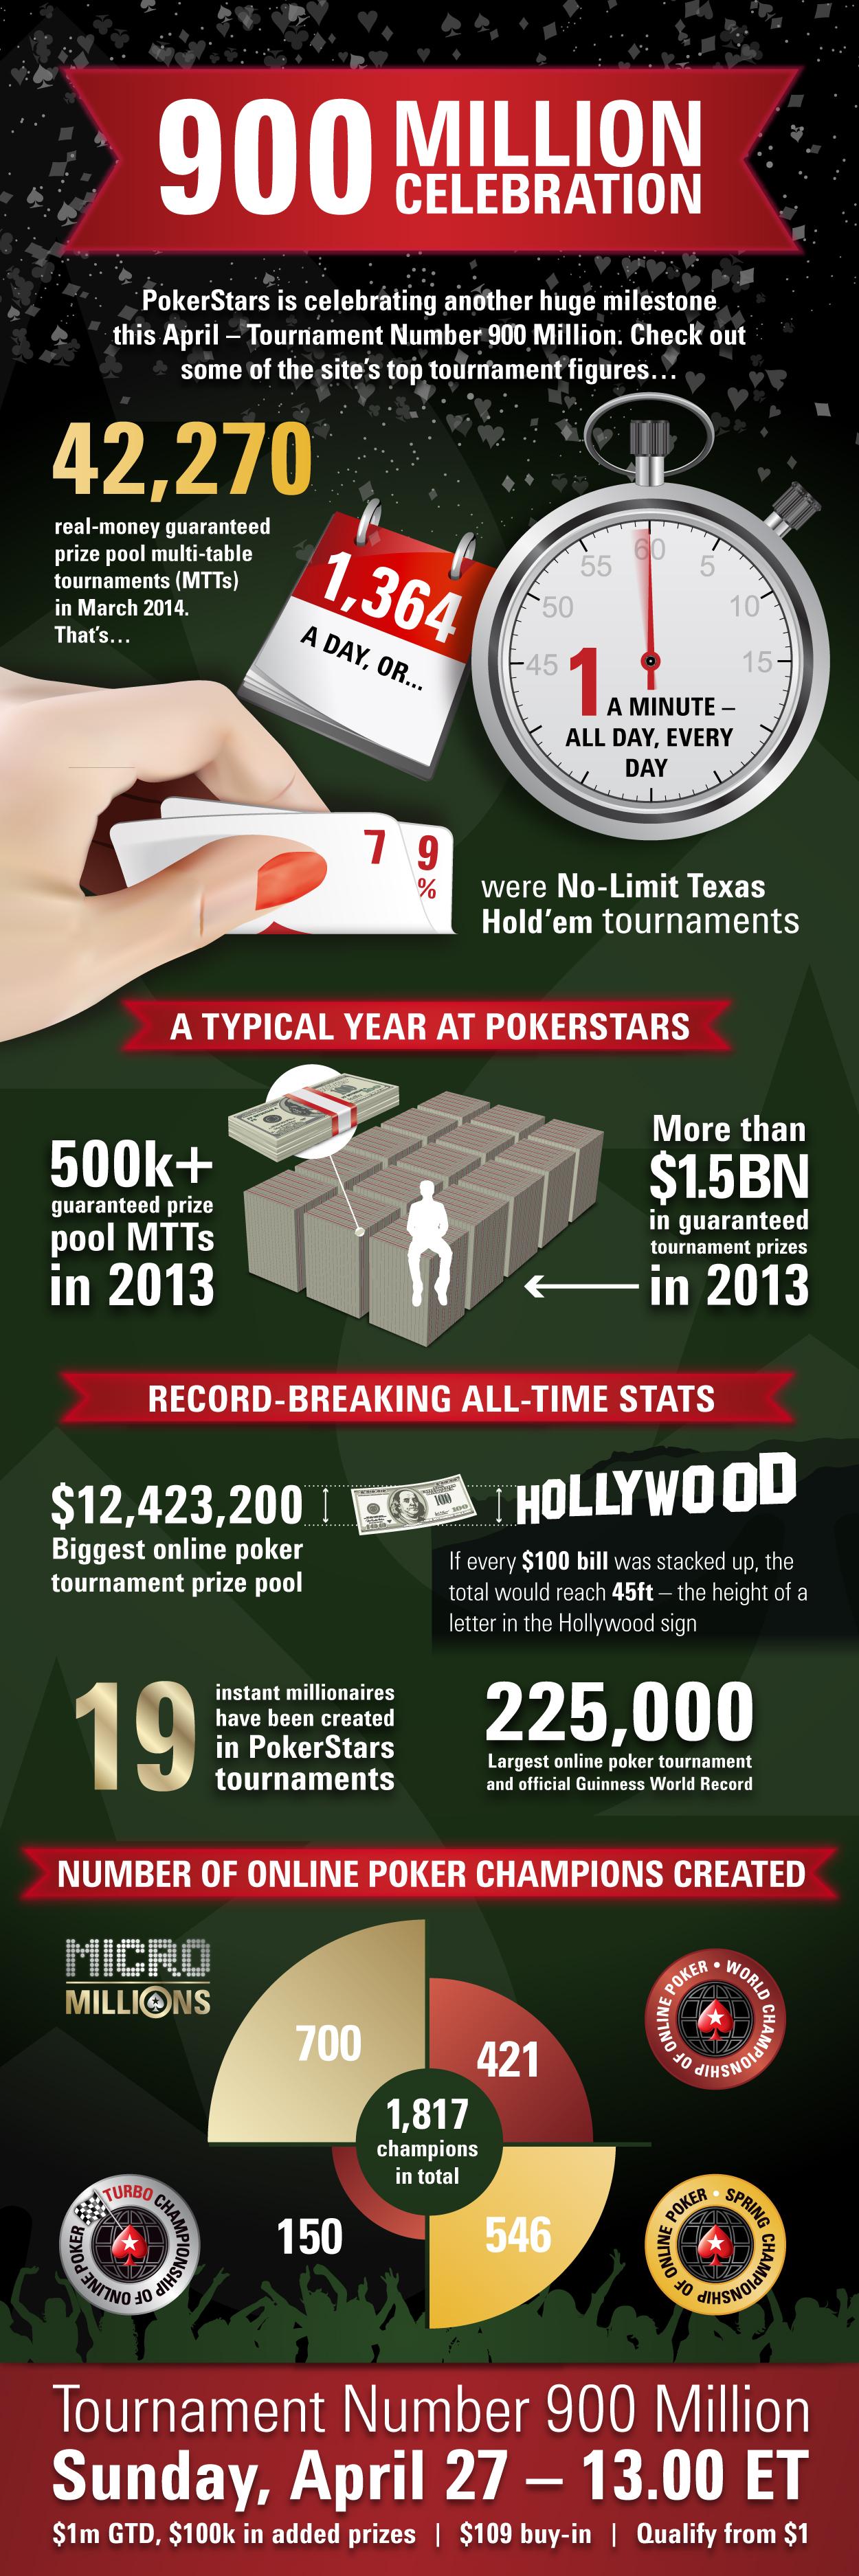 Infographic: PokerStars Celebrates 900 Millionth Tournament 101